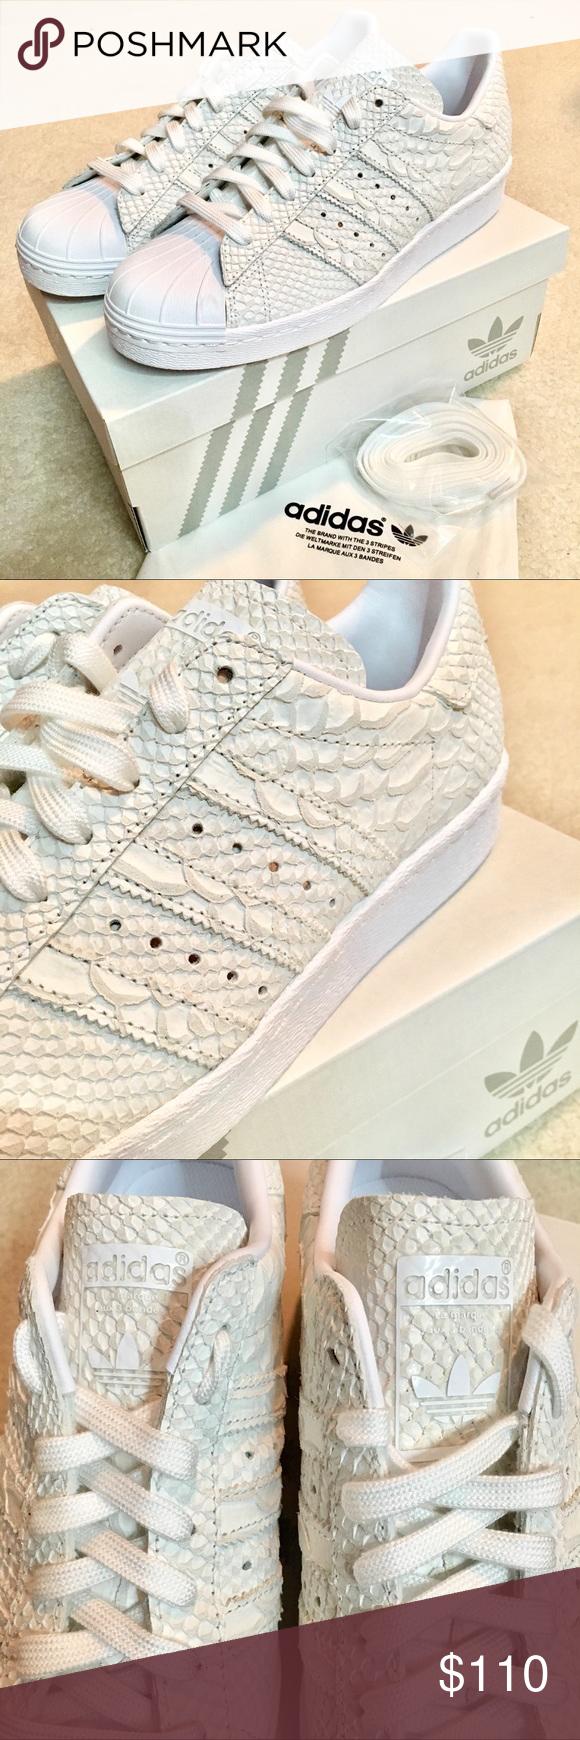 Adidas Superstar 80's Sneakers Custom made mi Superstar 80's